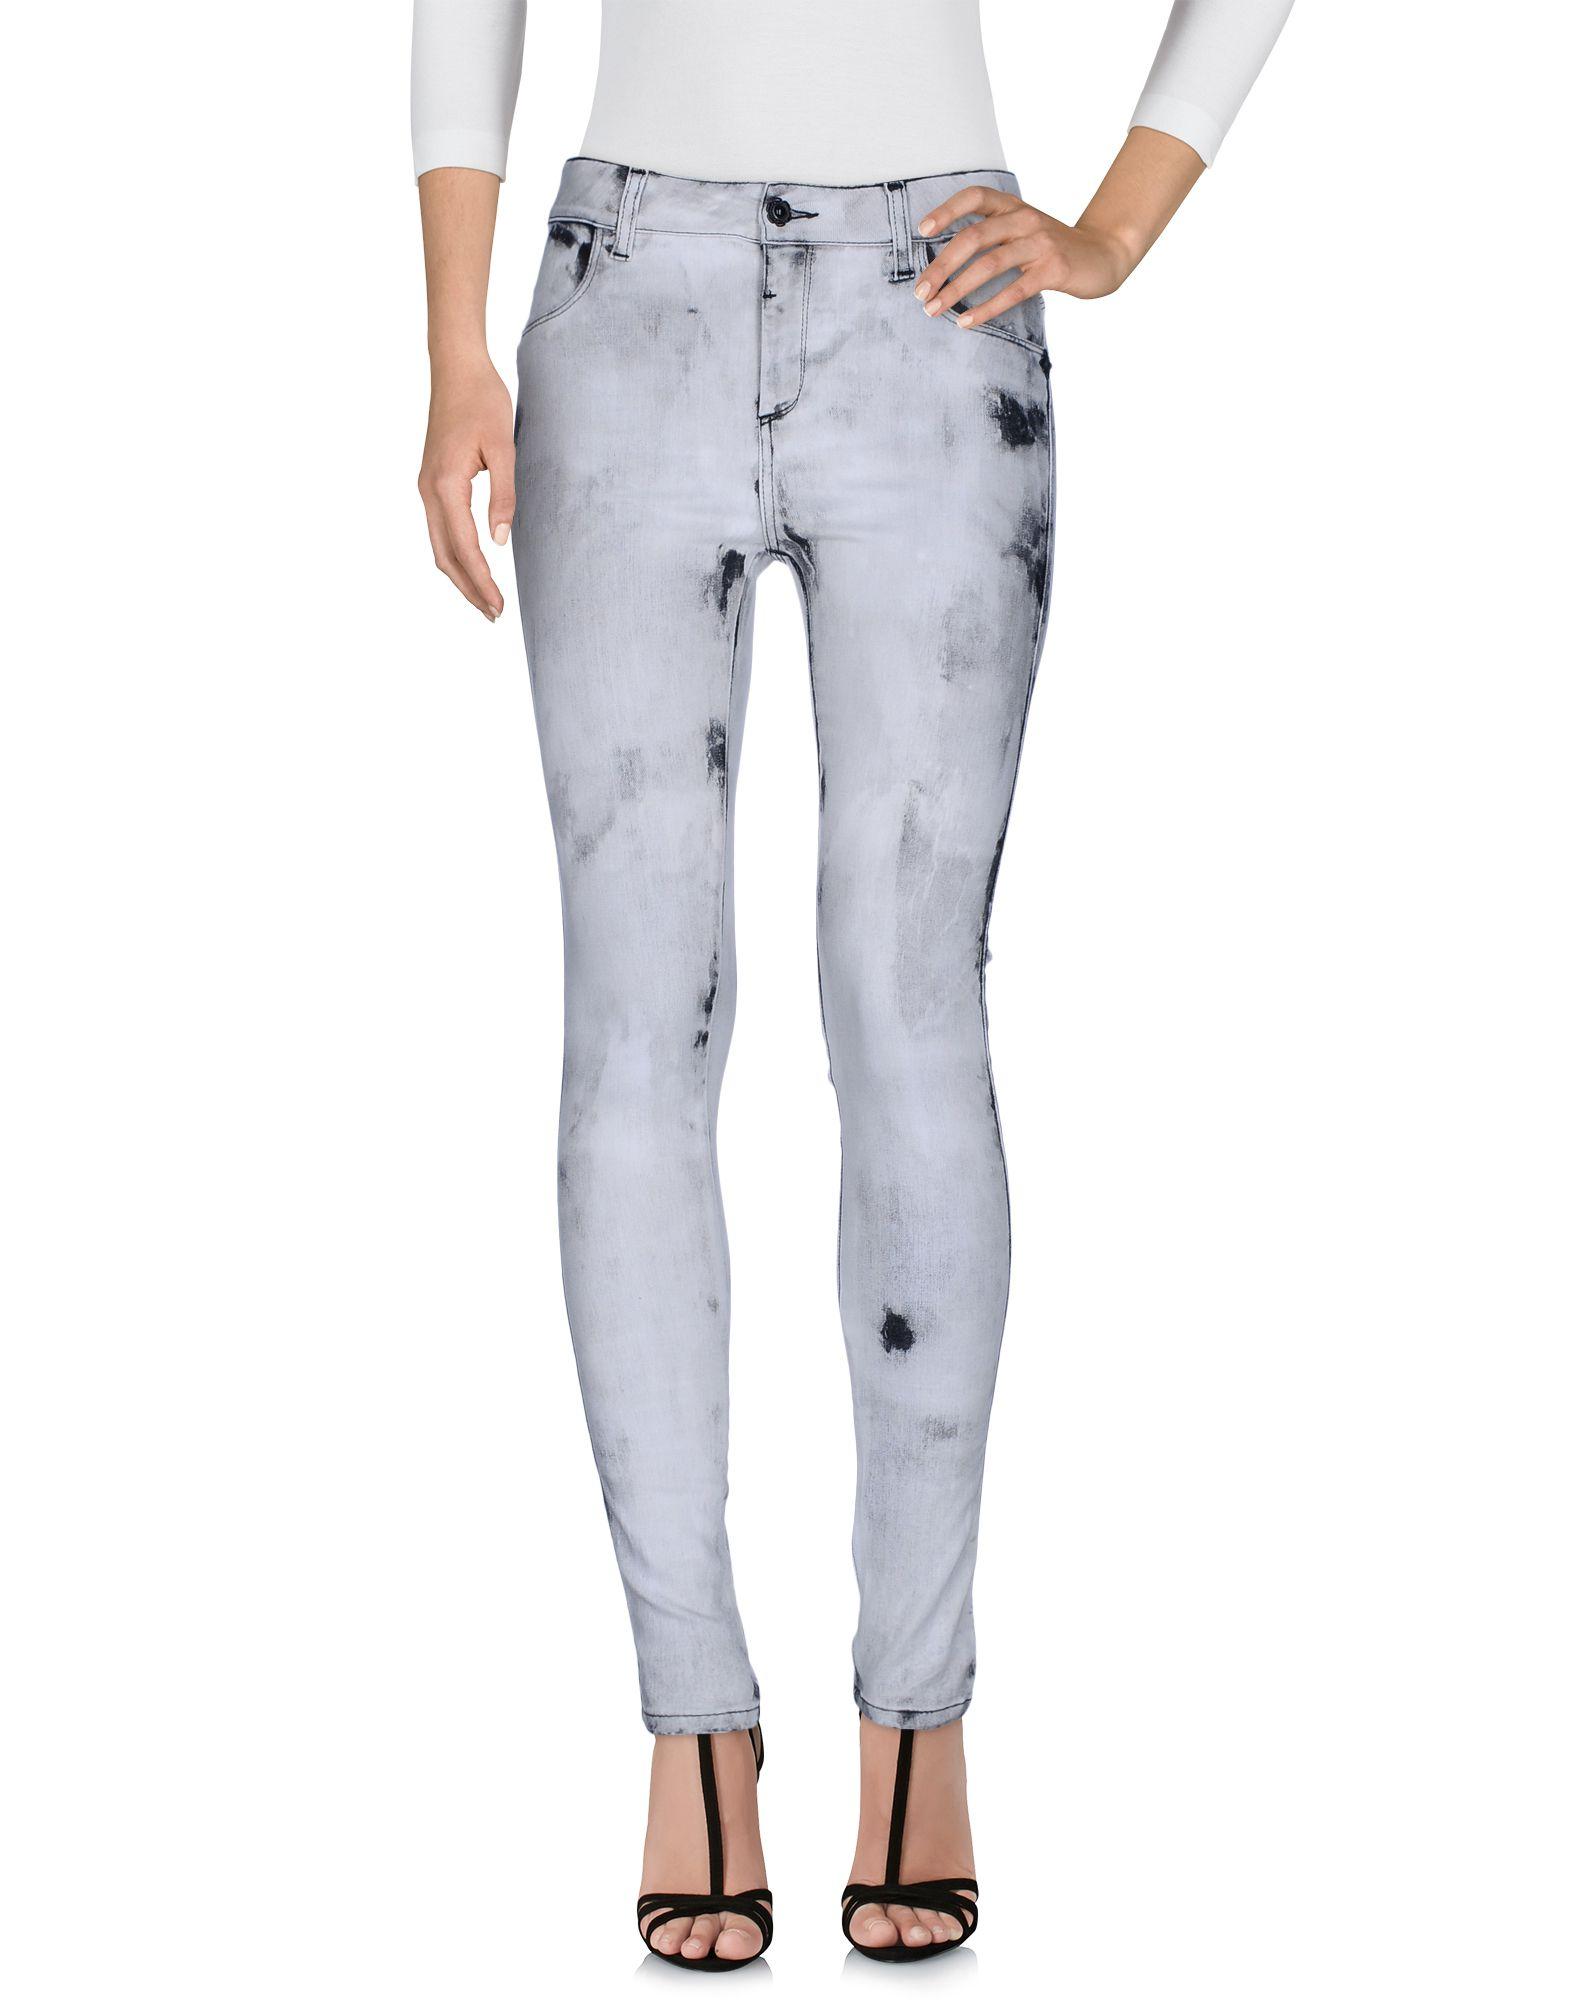 AB/SOUL Damen Jeanshose Farbe Hellgrau Größe 8